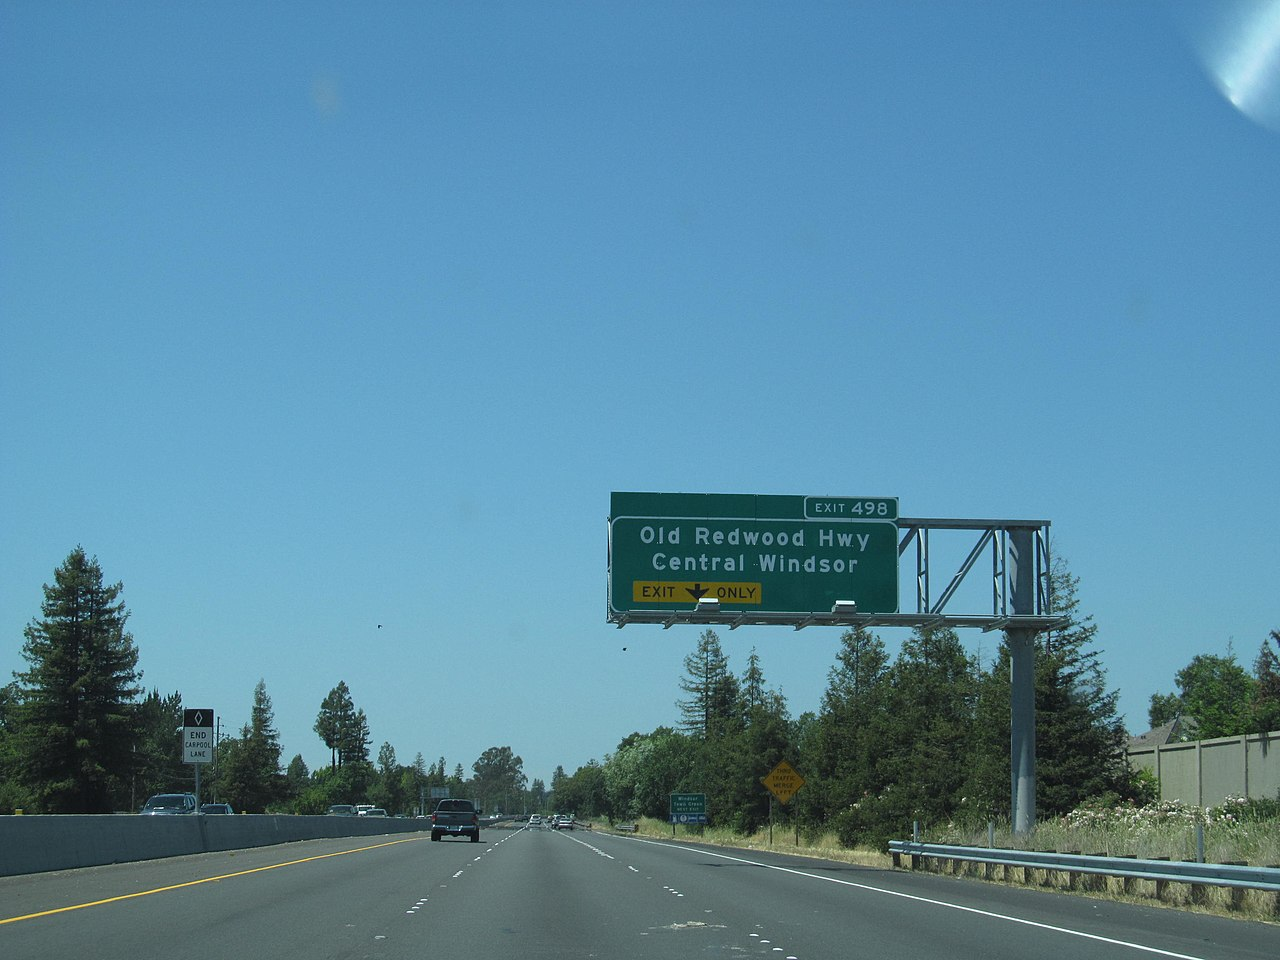 Highway 101, California: Address, Highway 101 Reviews: 5/5